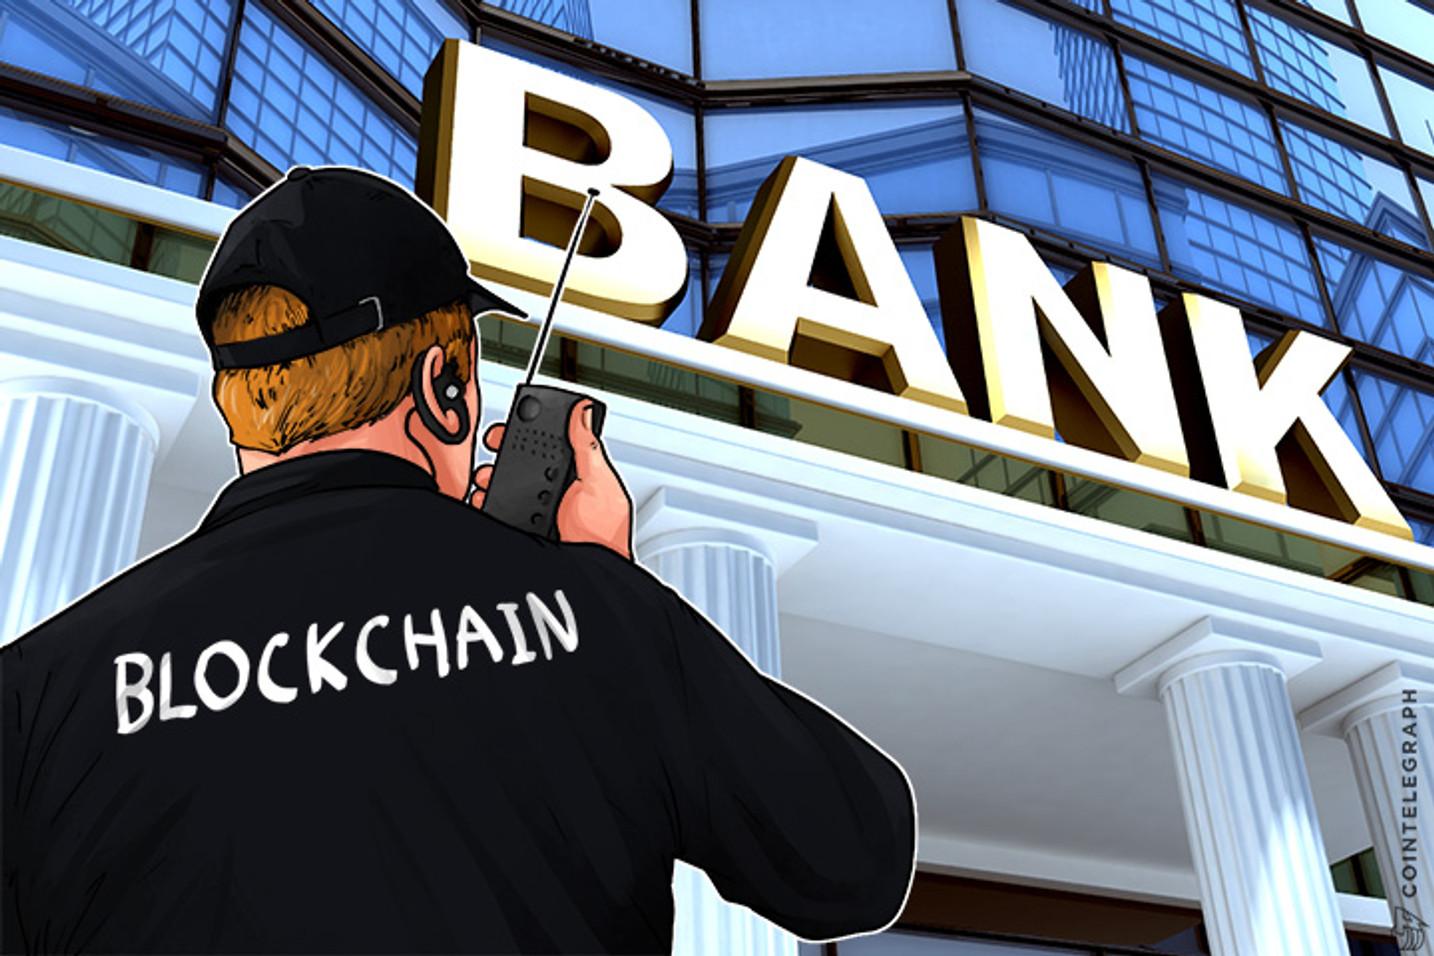 University of Pennsylvania: Blockchain's Biggest Challenge is Security